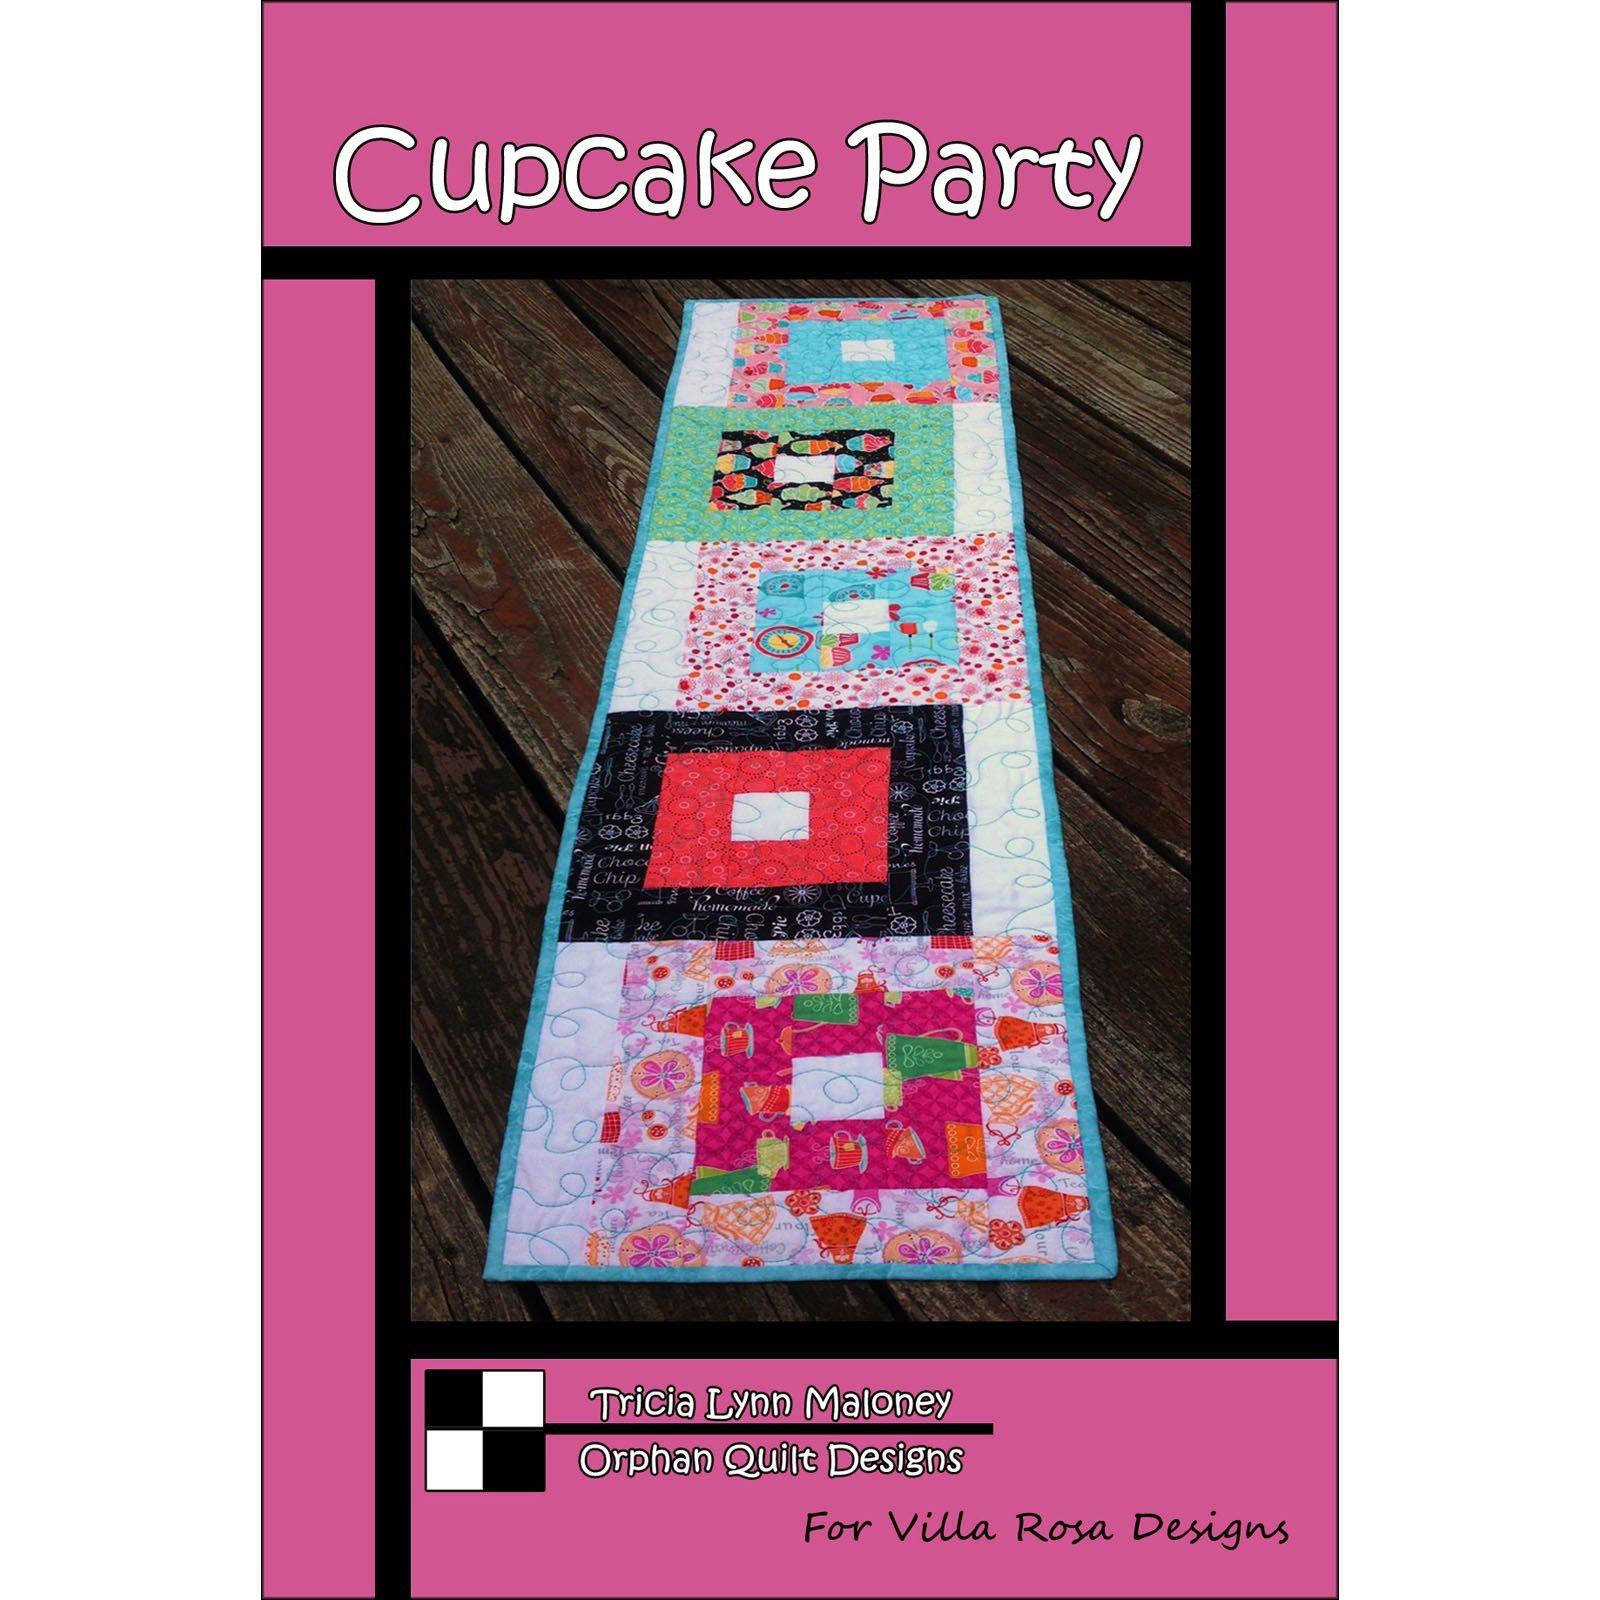 Cupcake Party - Table Runner Kit